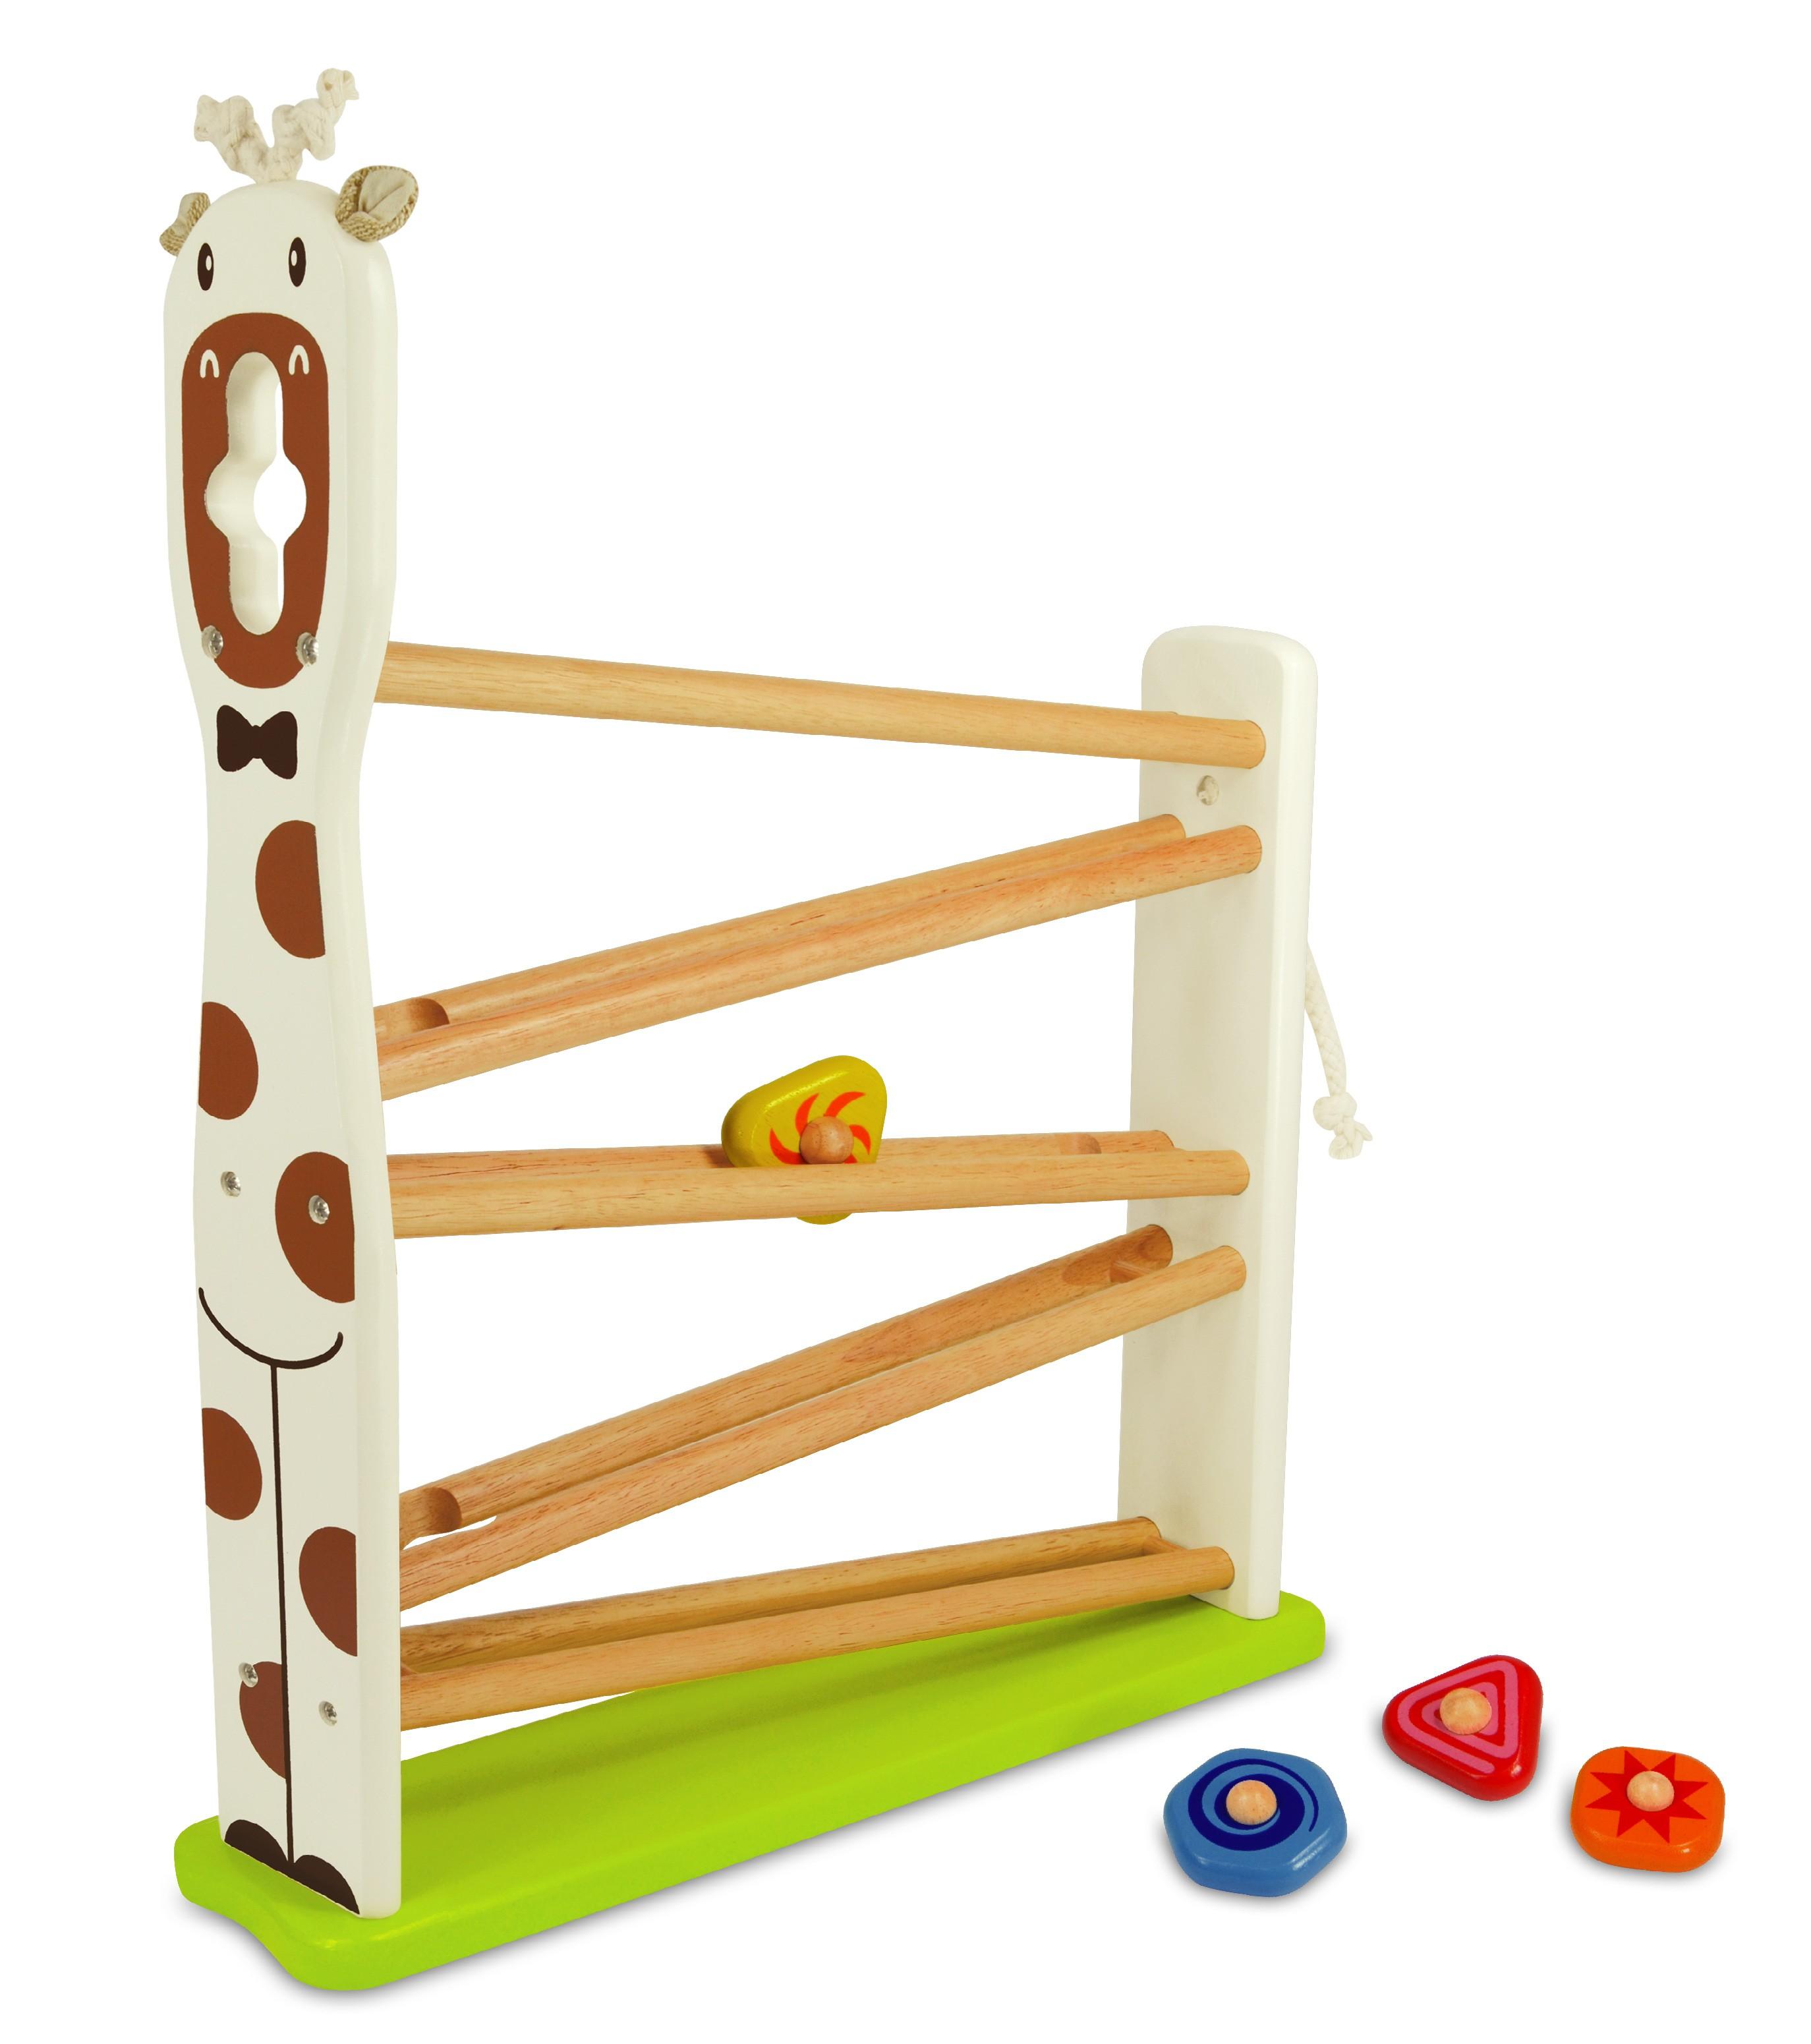 Развивающая игрушка I'm Toy Жирафик от Toyway